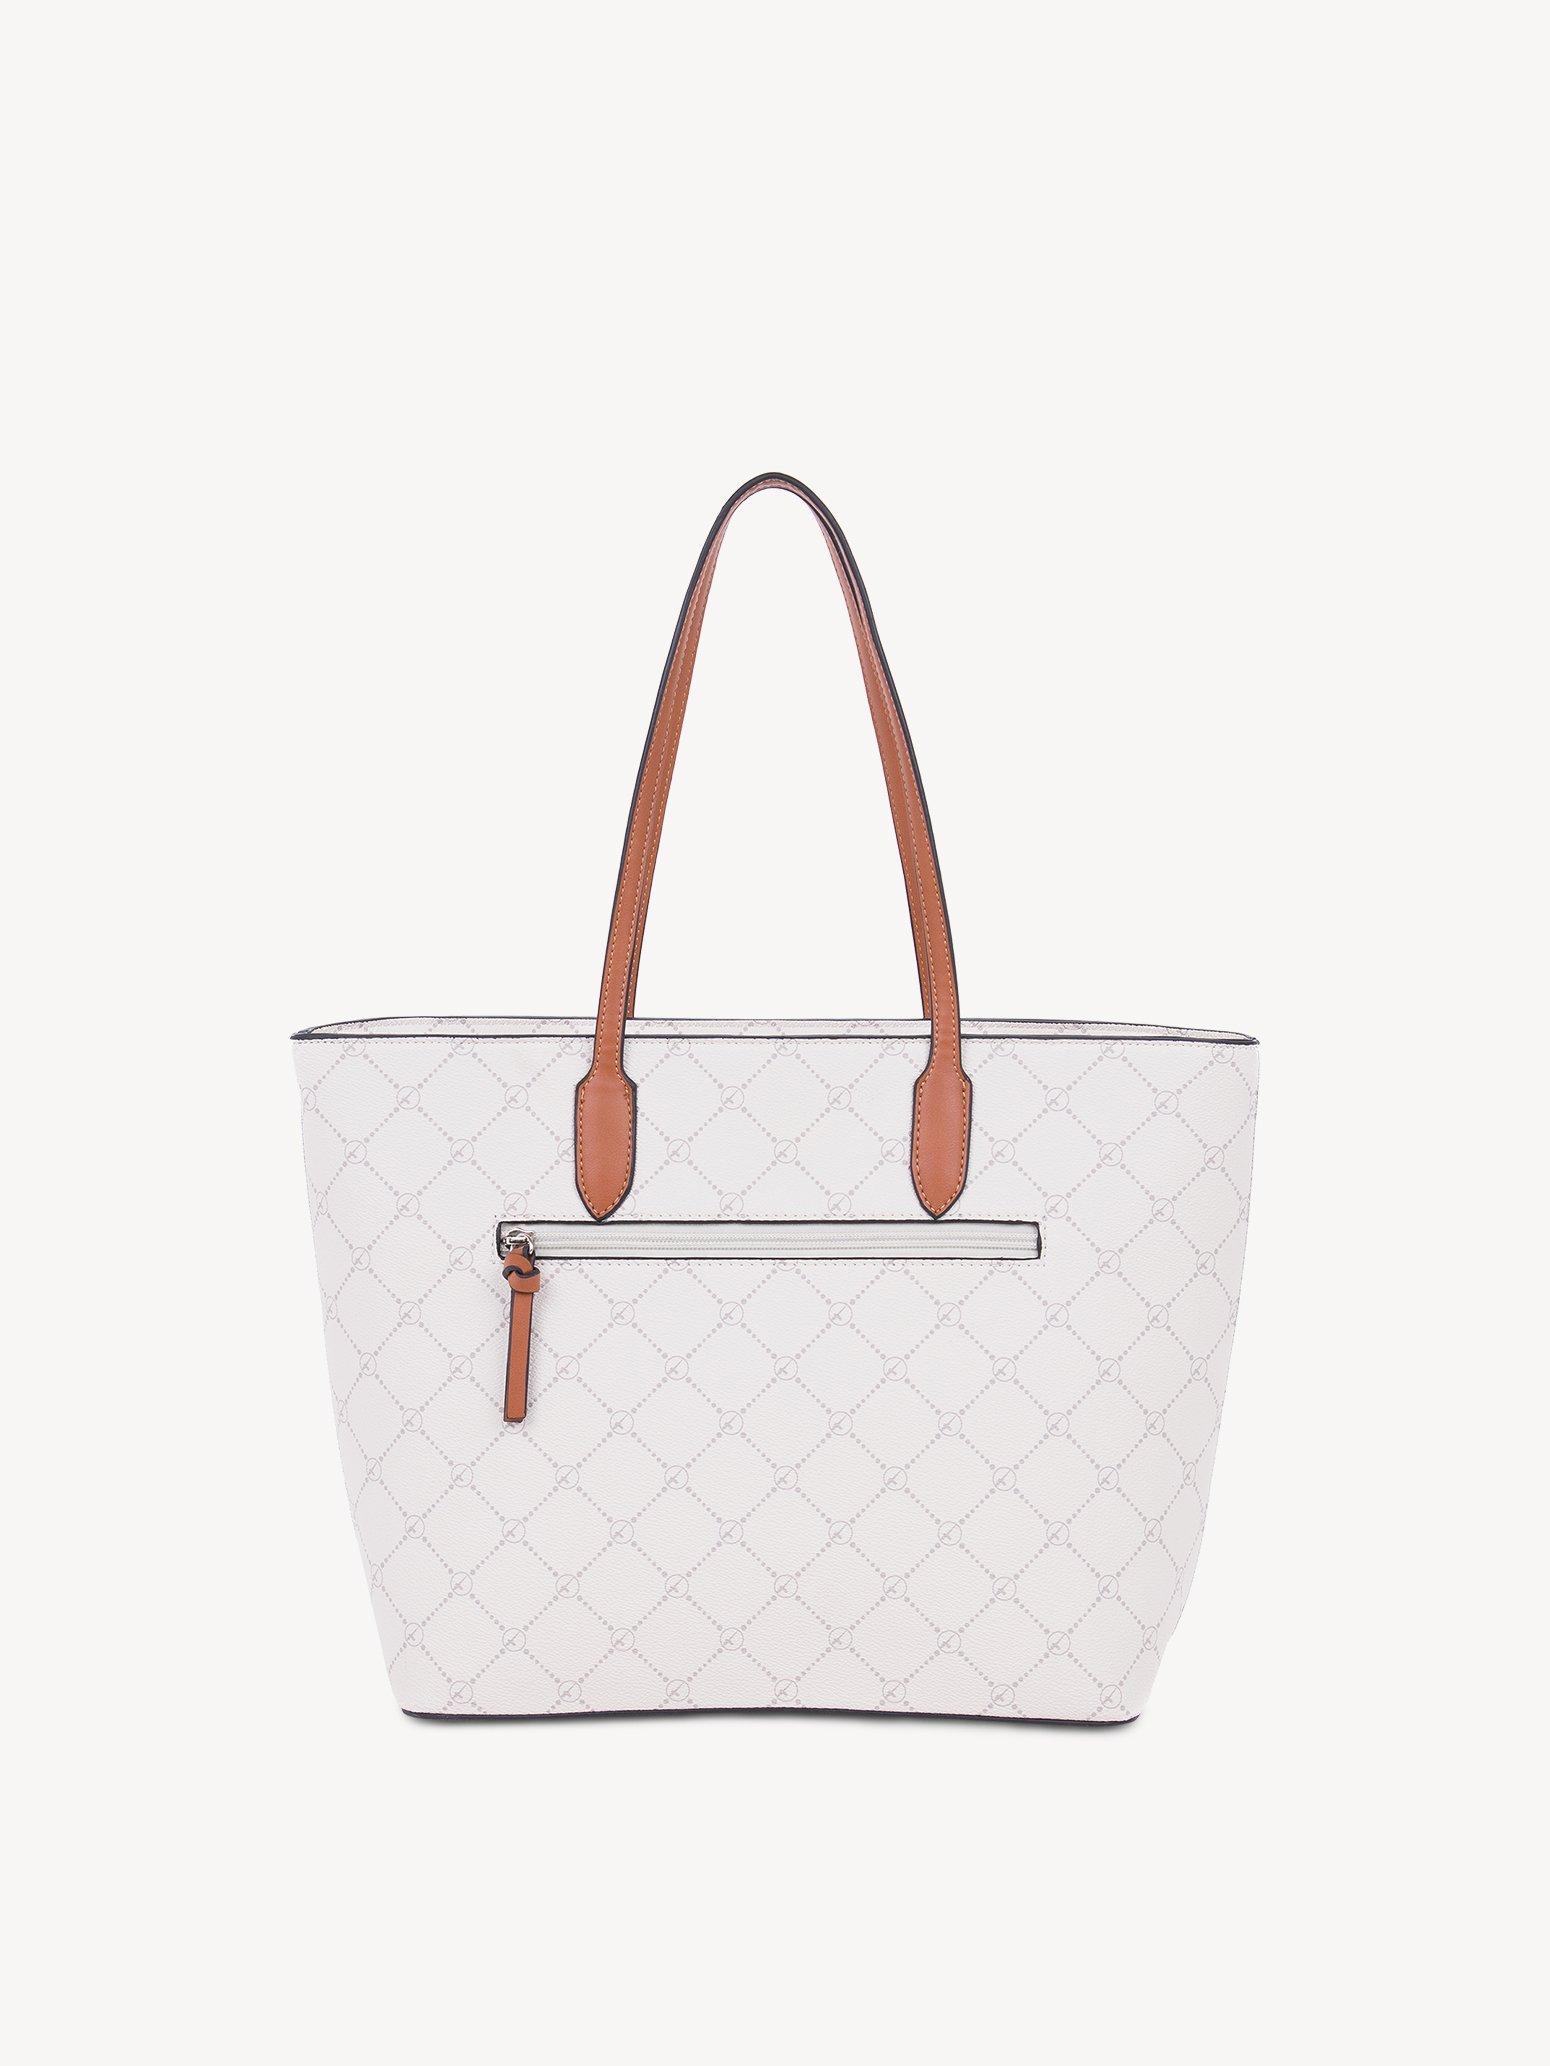 Сумка шоппер Tamaris 30107,320